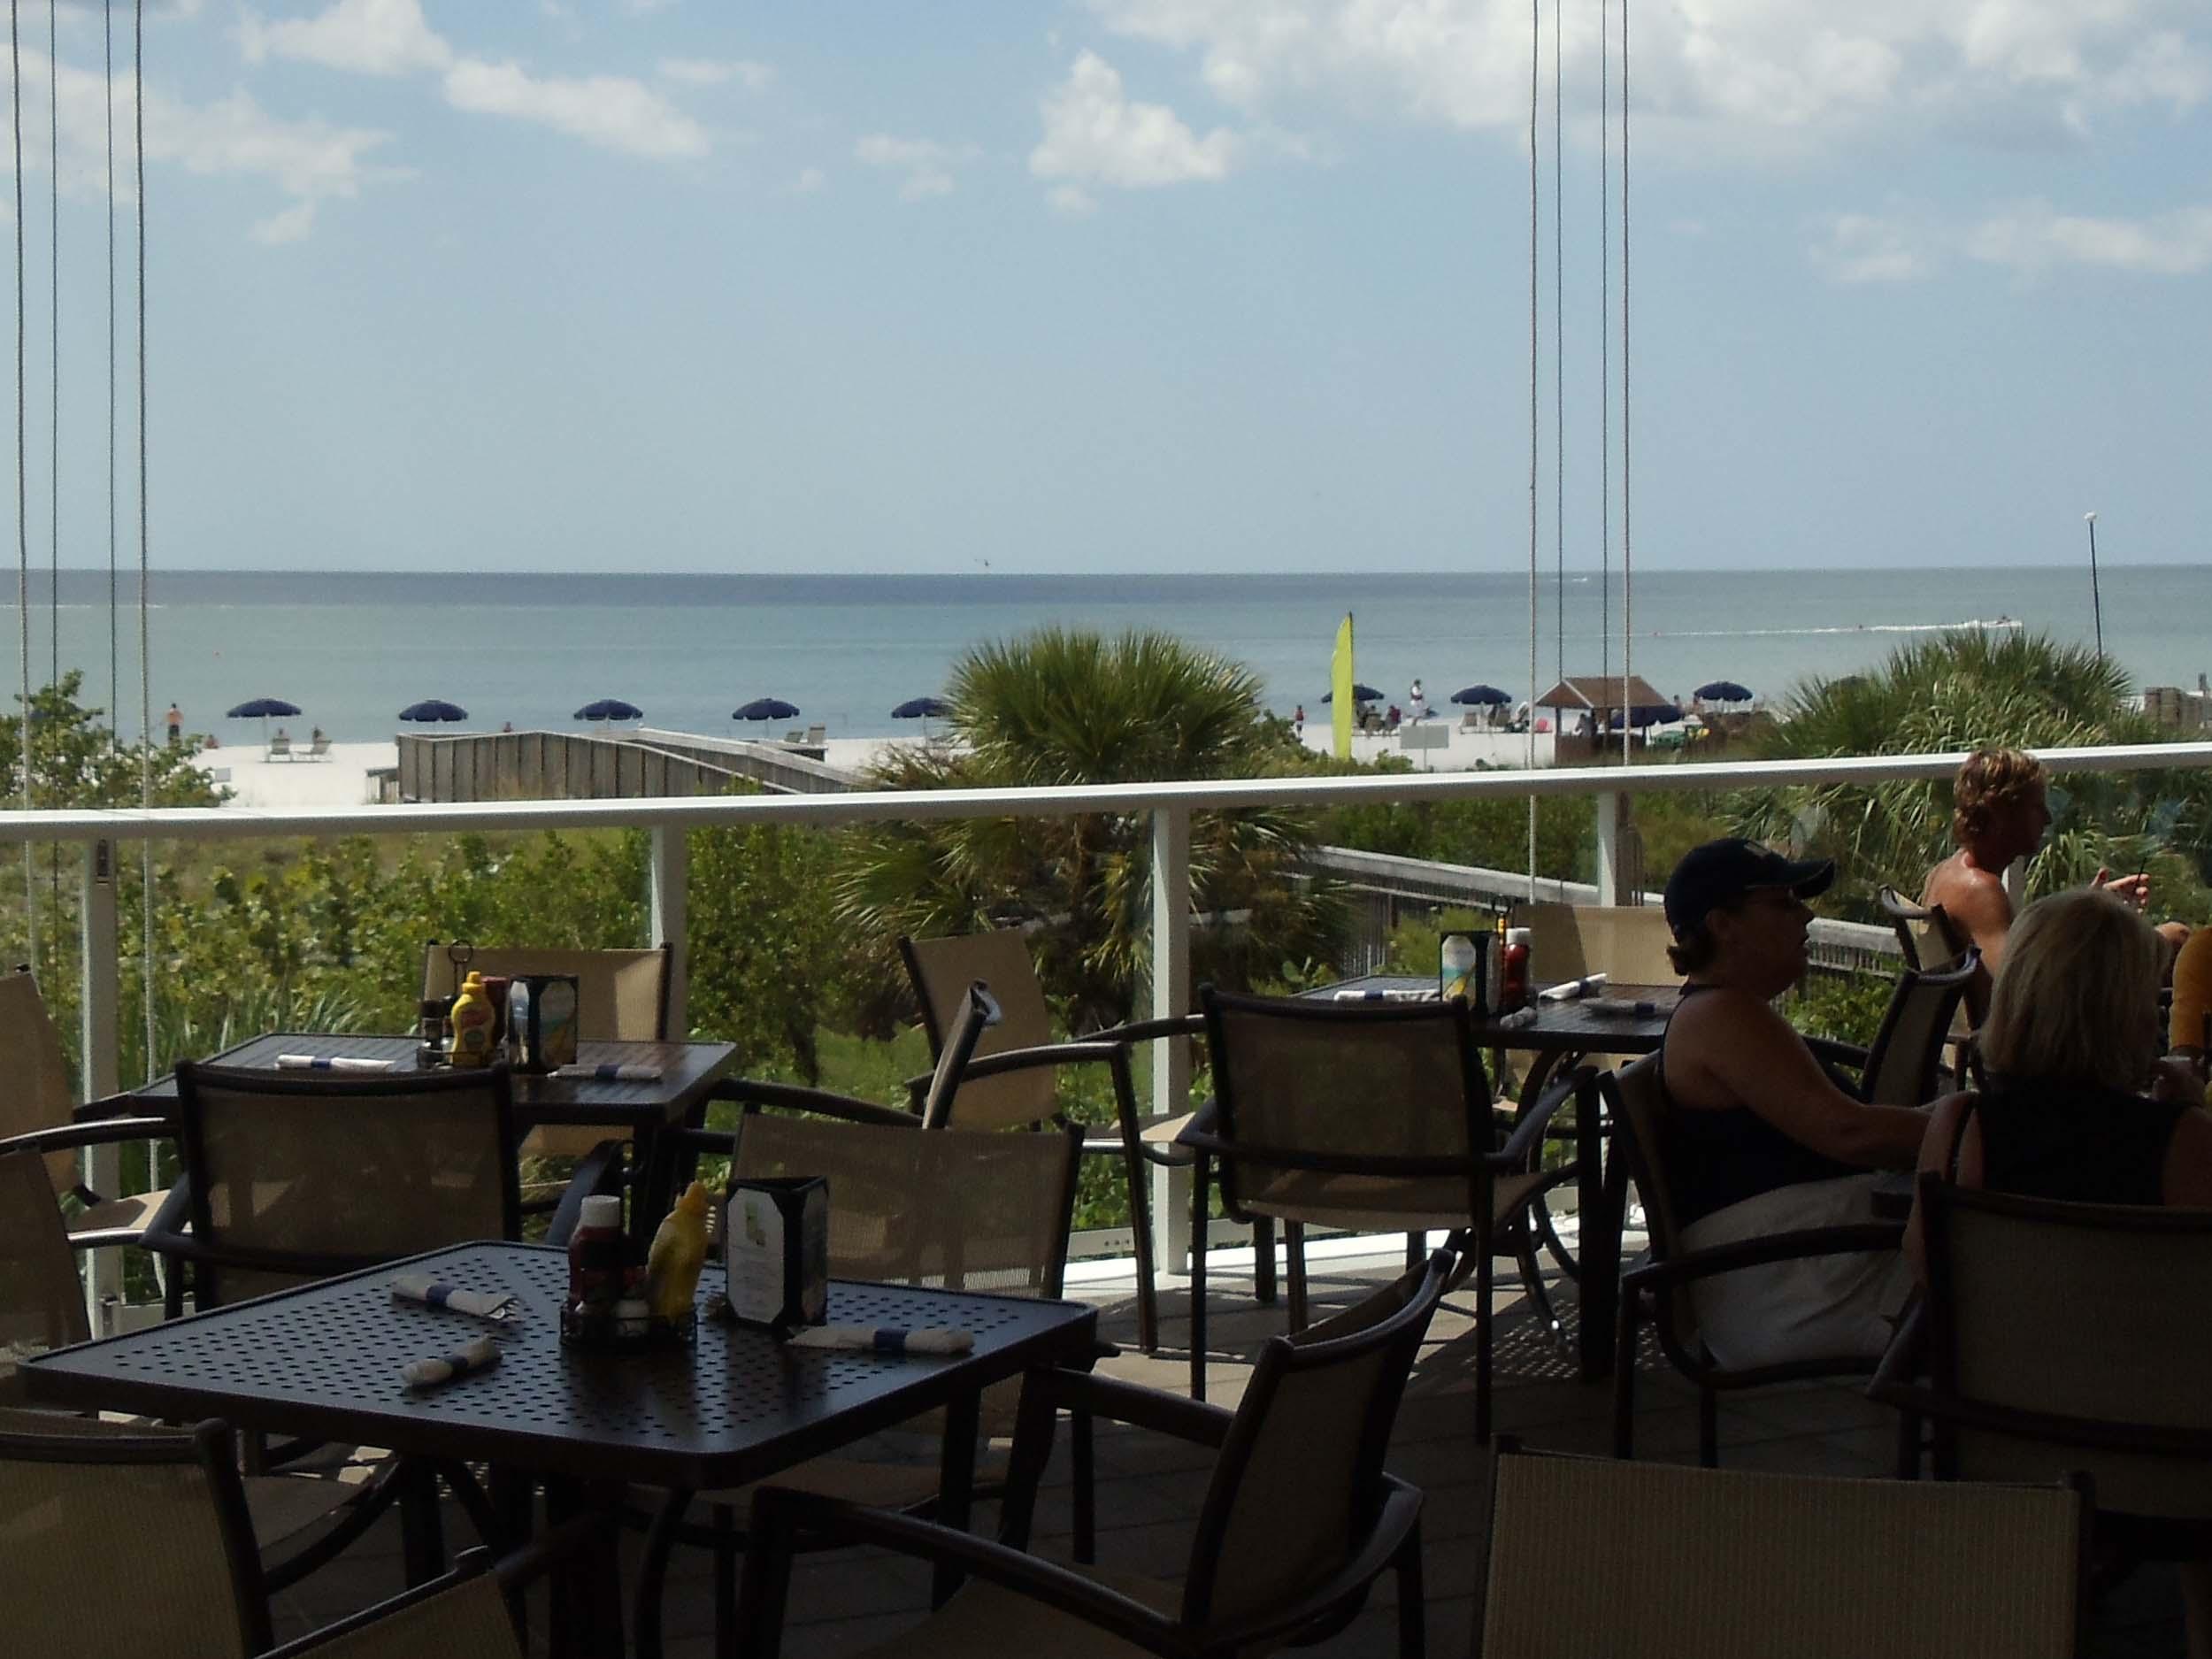 Stilts Beachside Bar and Grill Beach View